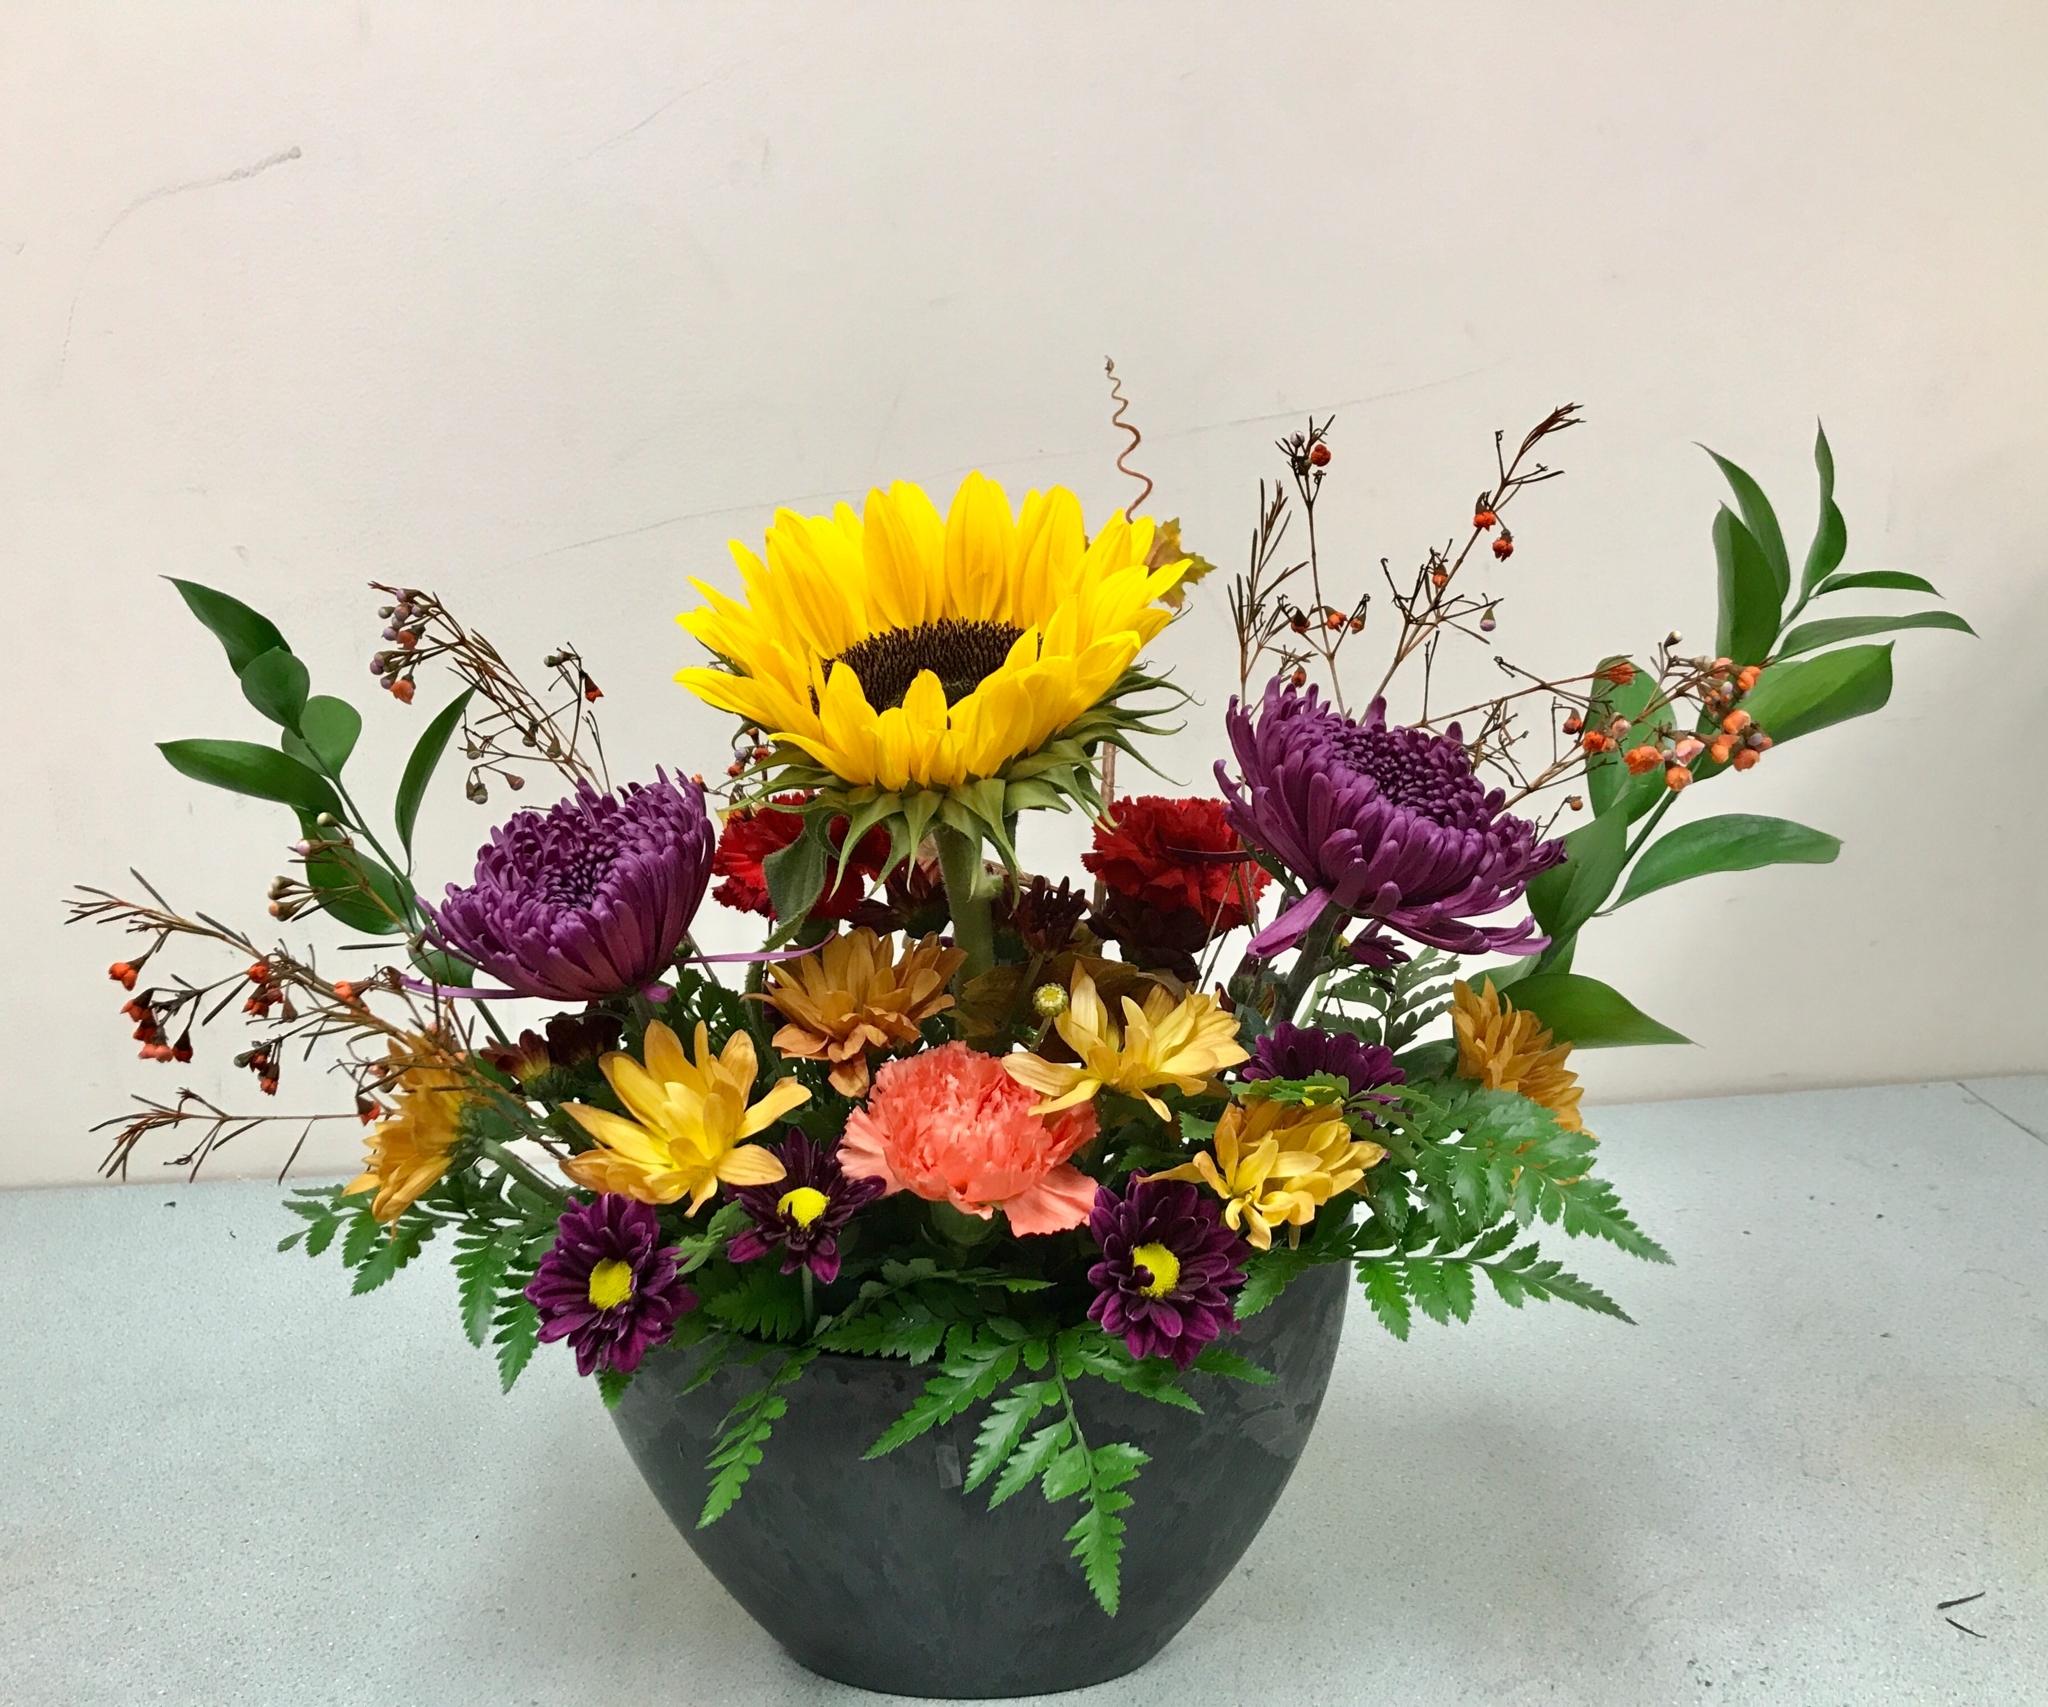 Glas florist ltd opening hours 1300 carling ave ottawa on izmirmasajfo Gallery